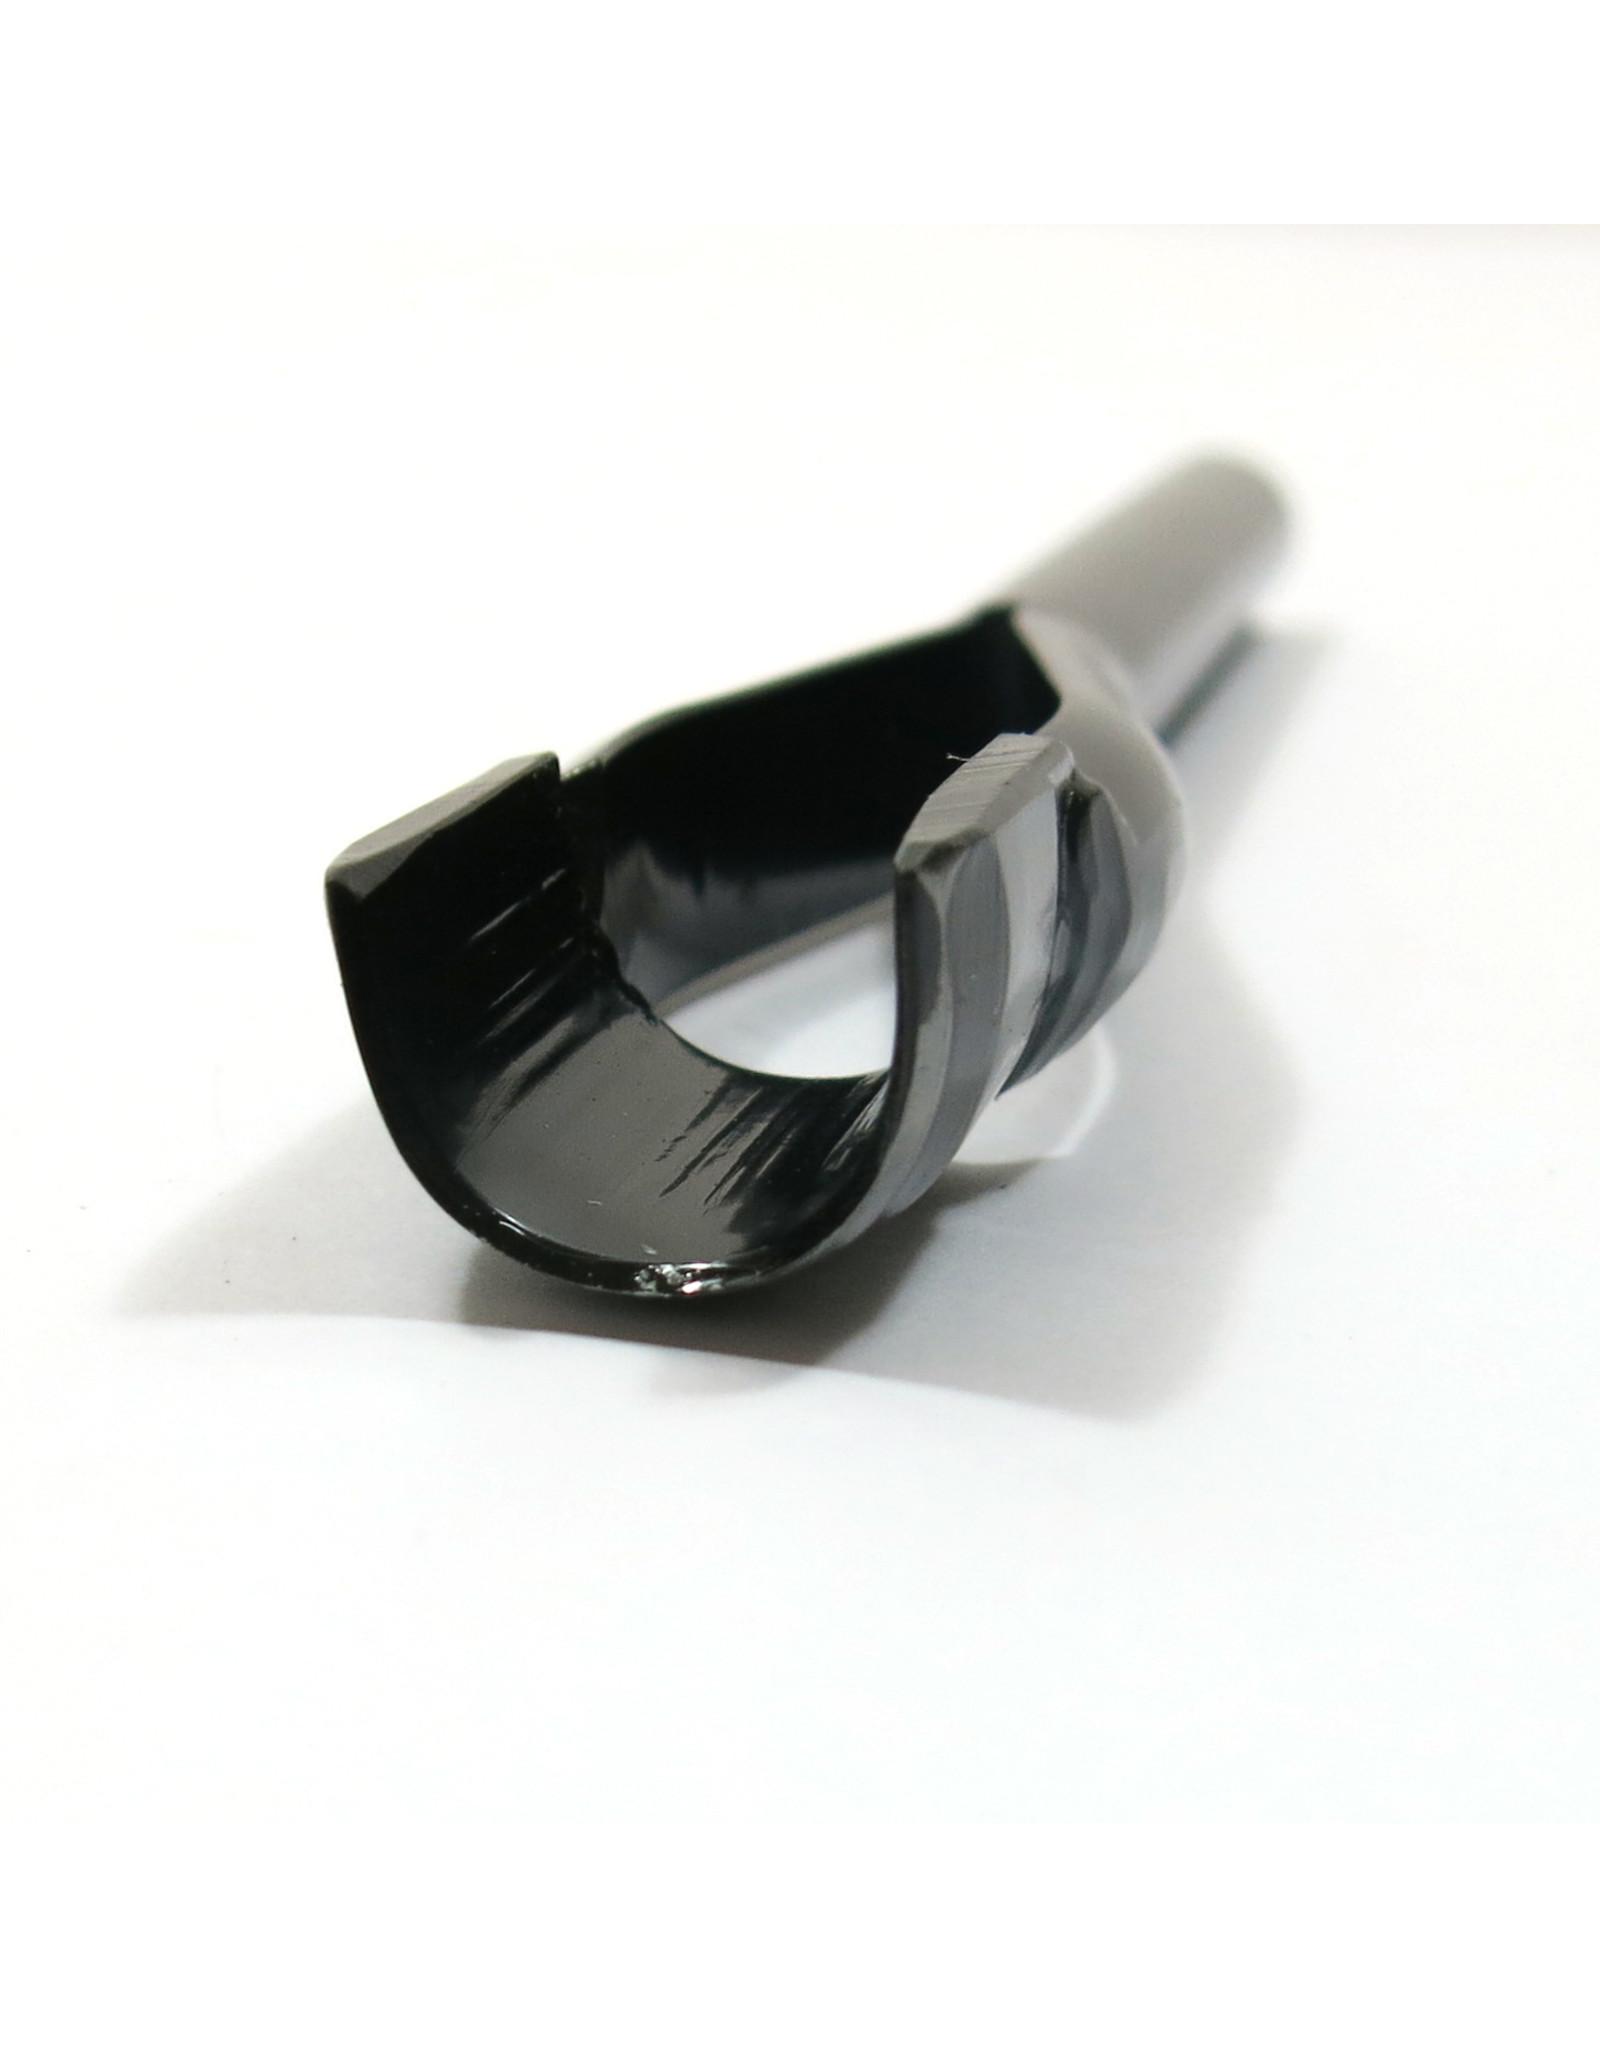 Strap end punch 15mm (round)